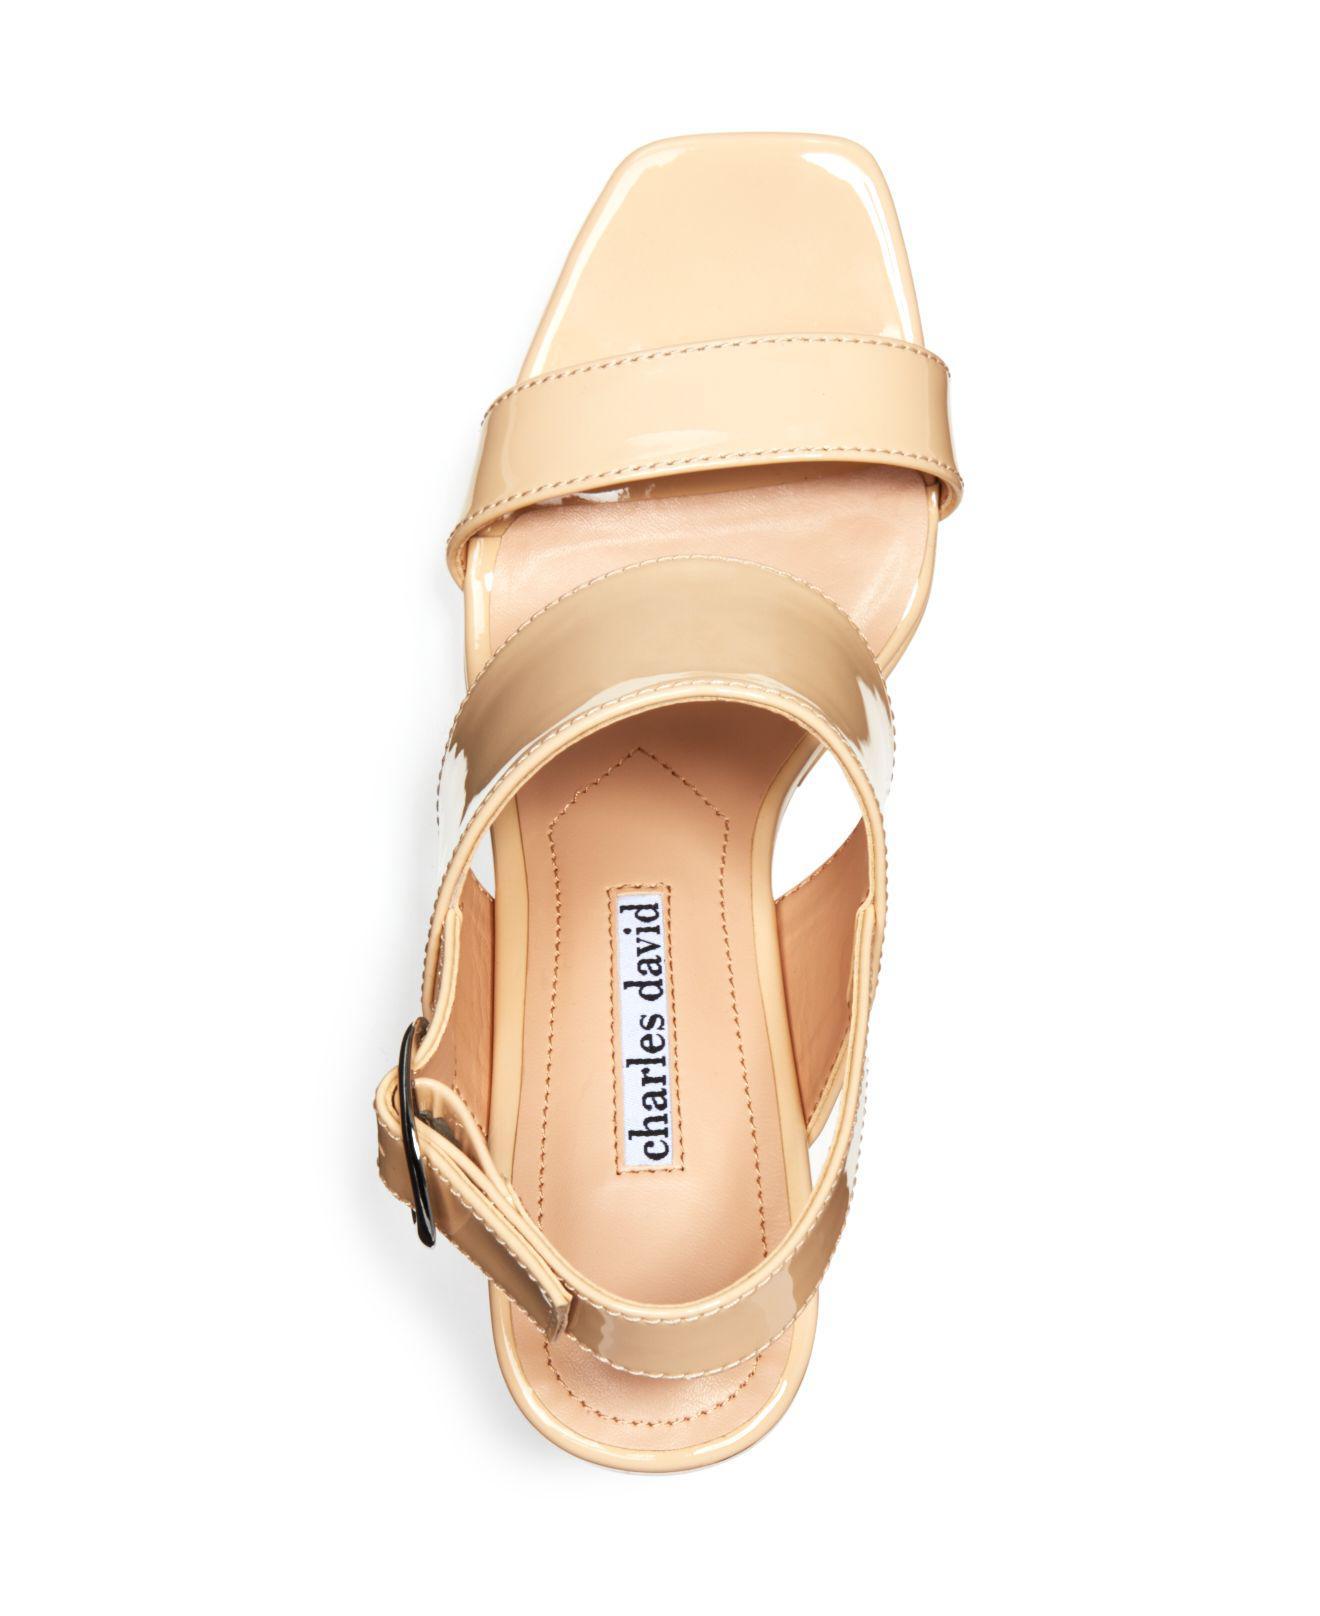 Charles David Jordan Patent Leather Wedge Platform Sandal TIJTZq30